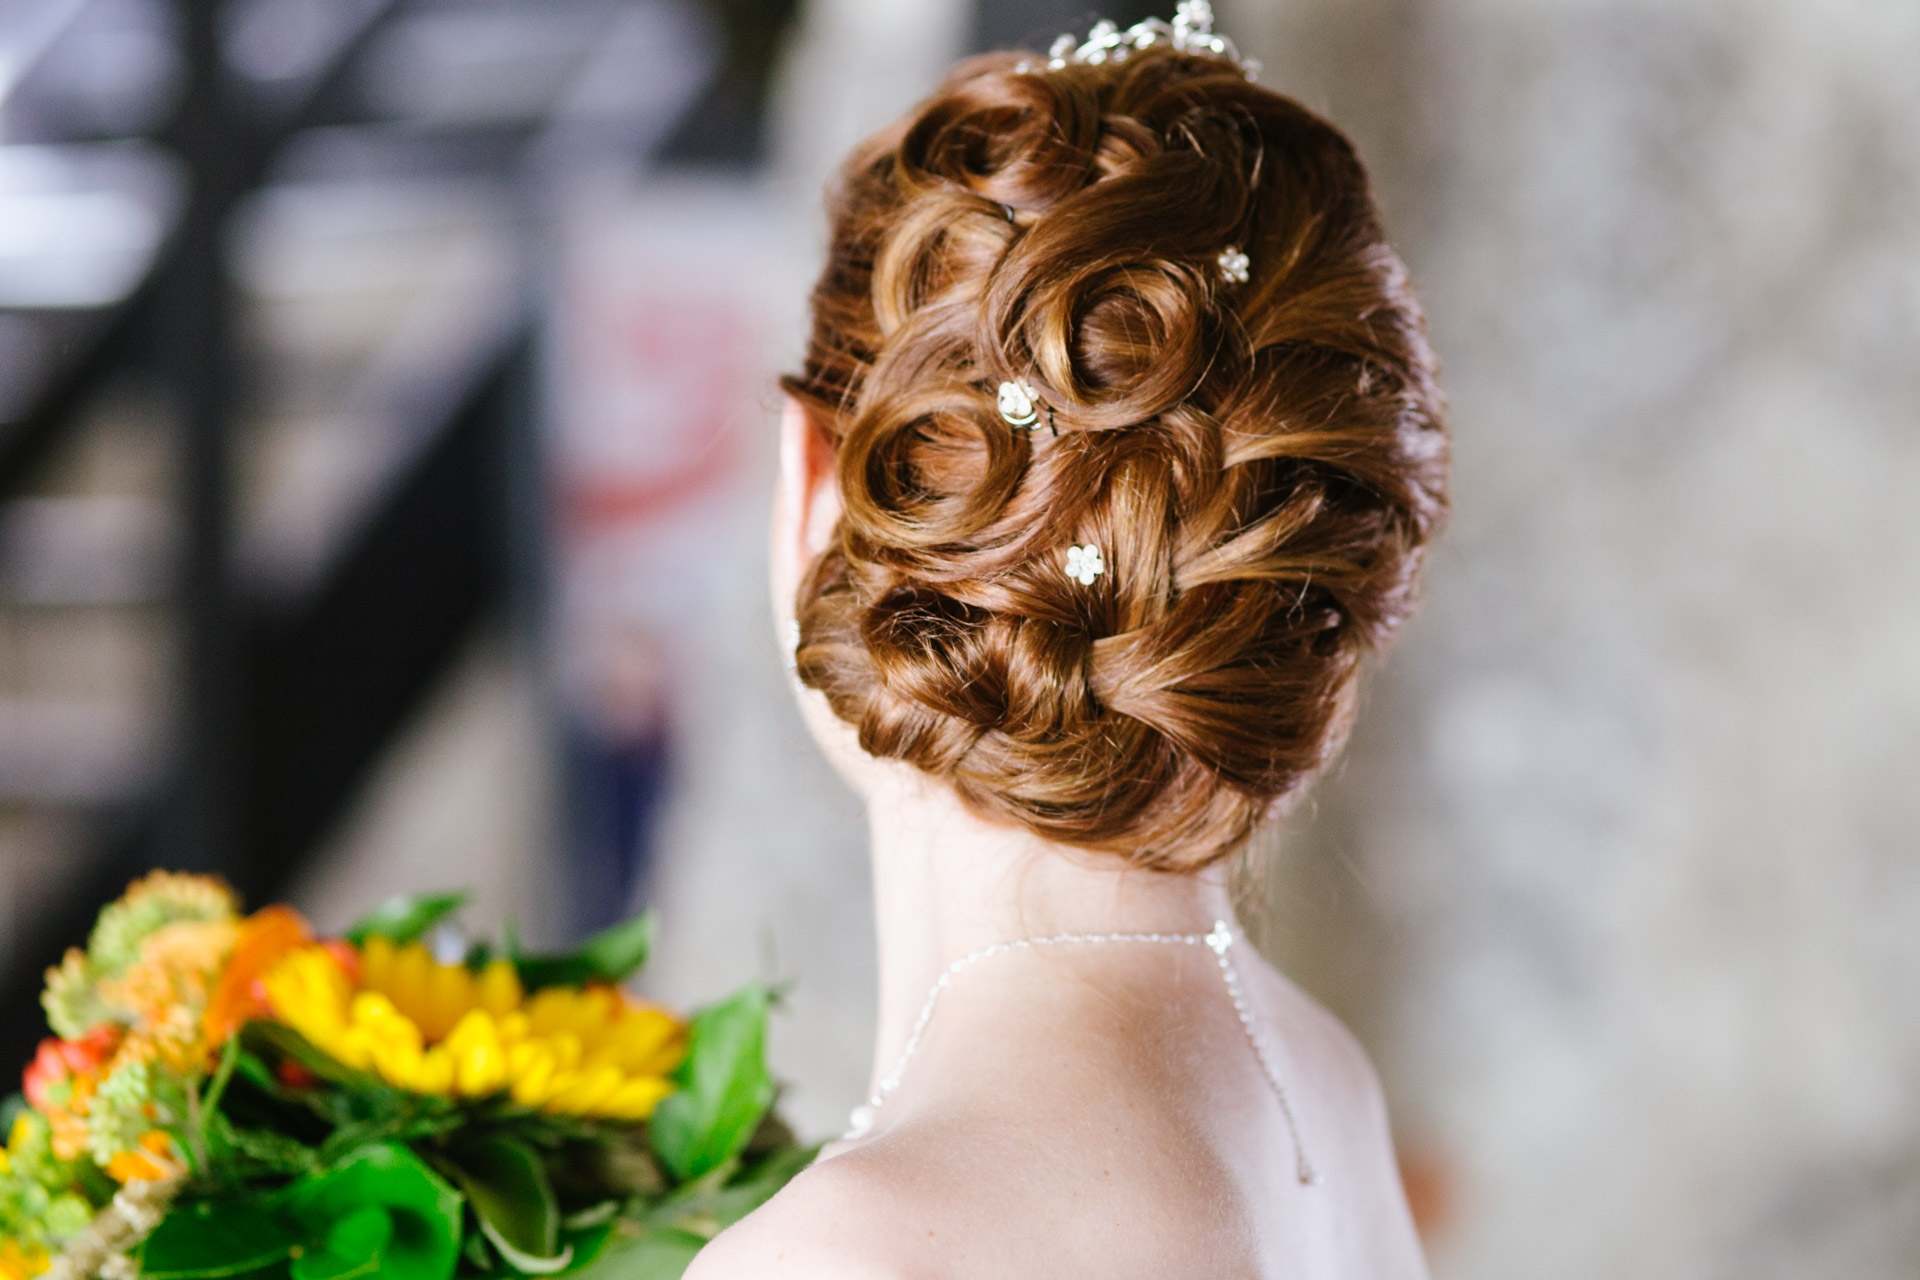 Pixelart_Hochzeitsfotografen_Loerrach_Rheinfelden_Hallwil_Schweiz_Linda-Ramon-1004